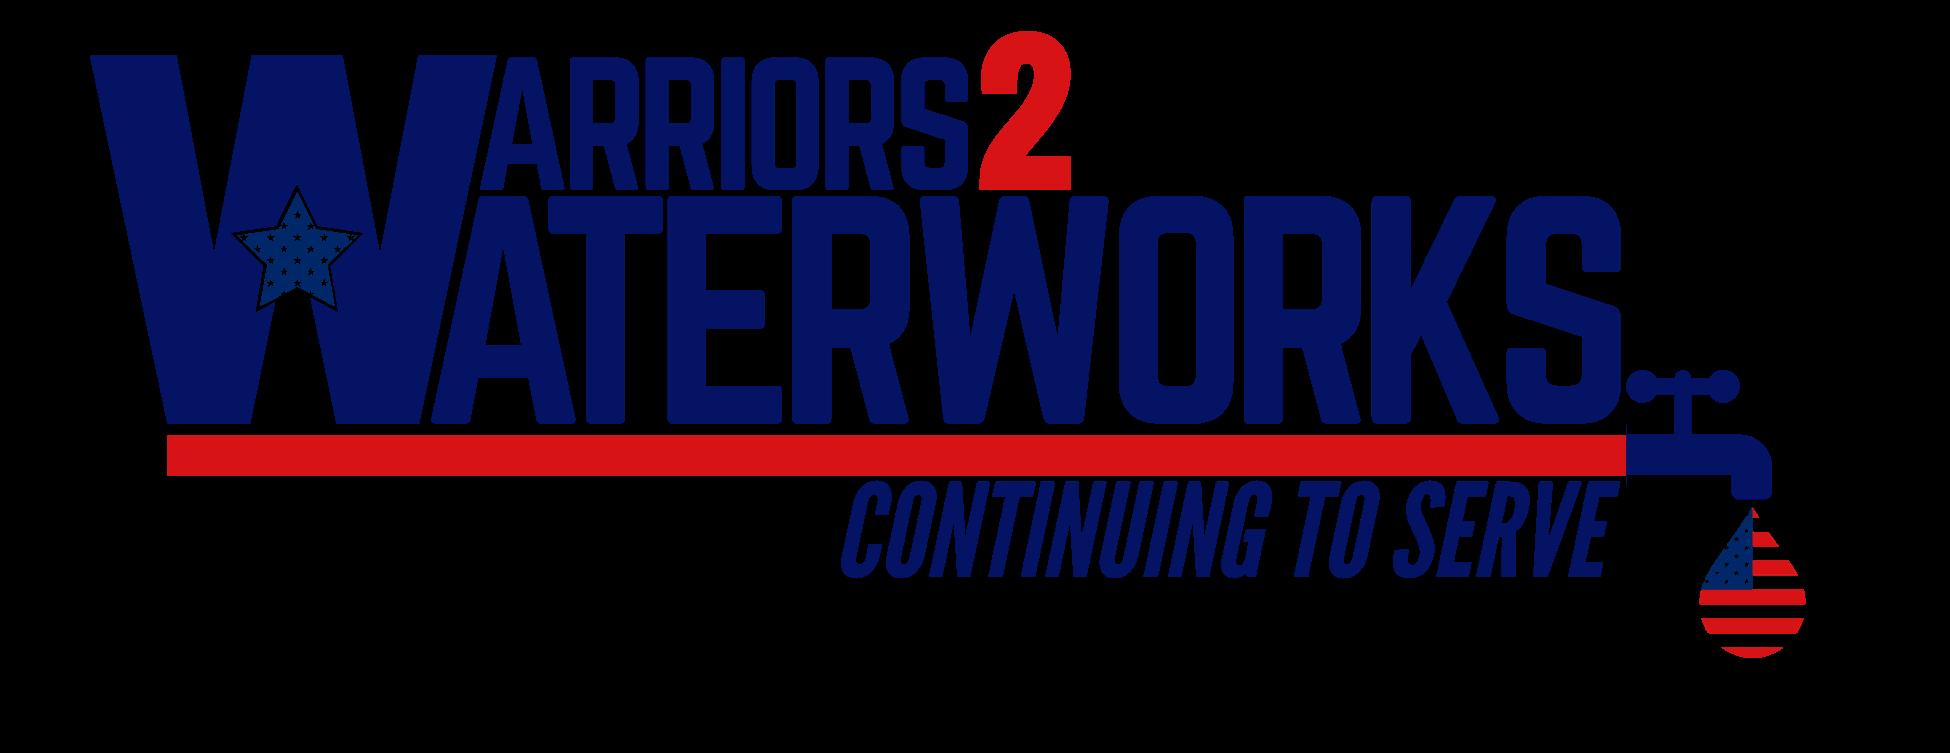 Warriors 2 WaterWorks logo